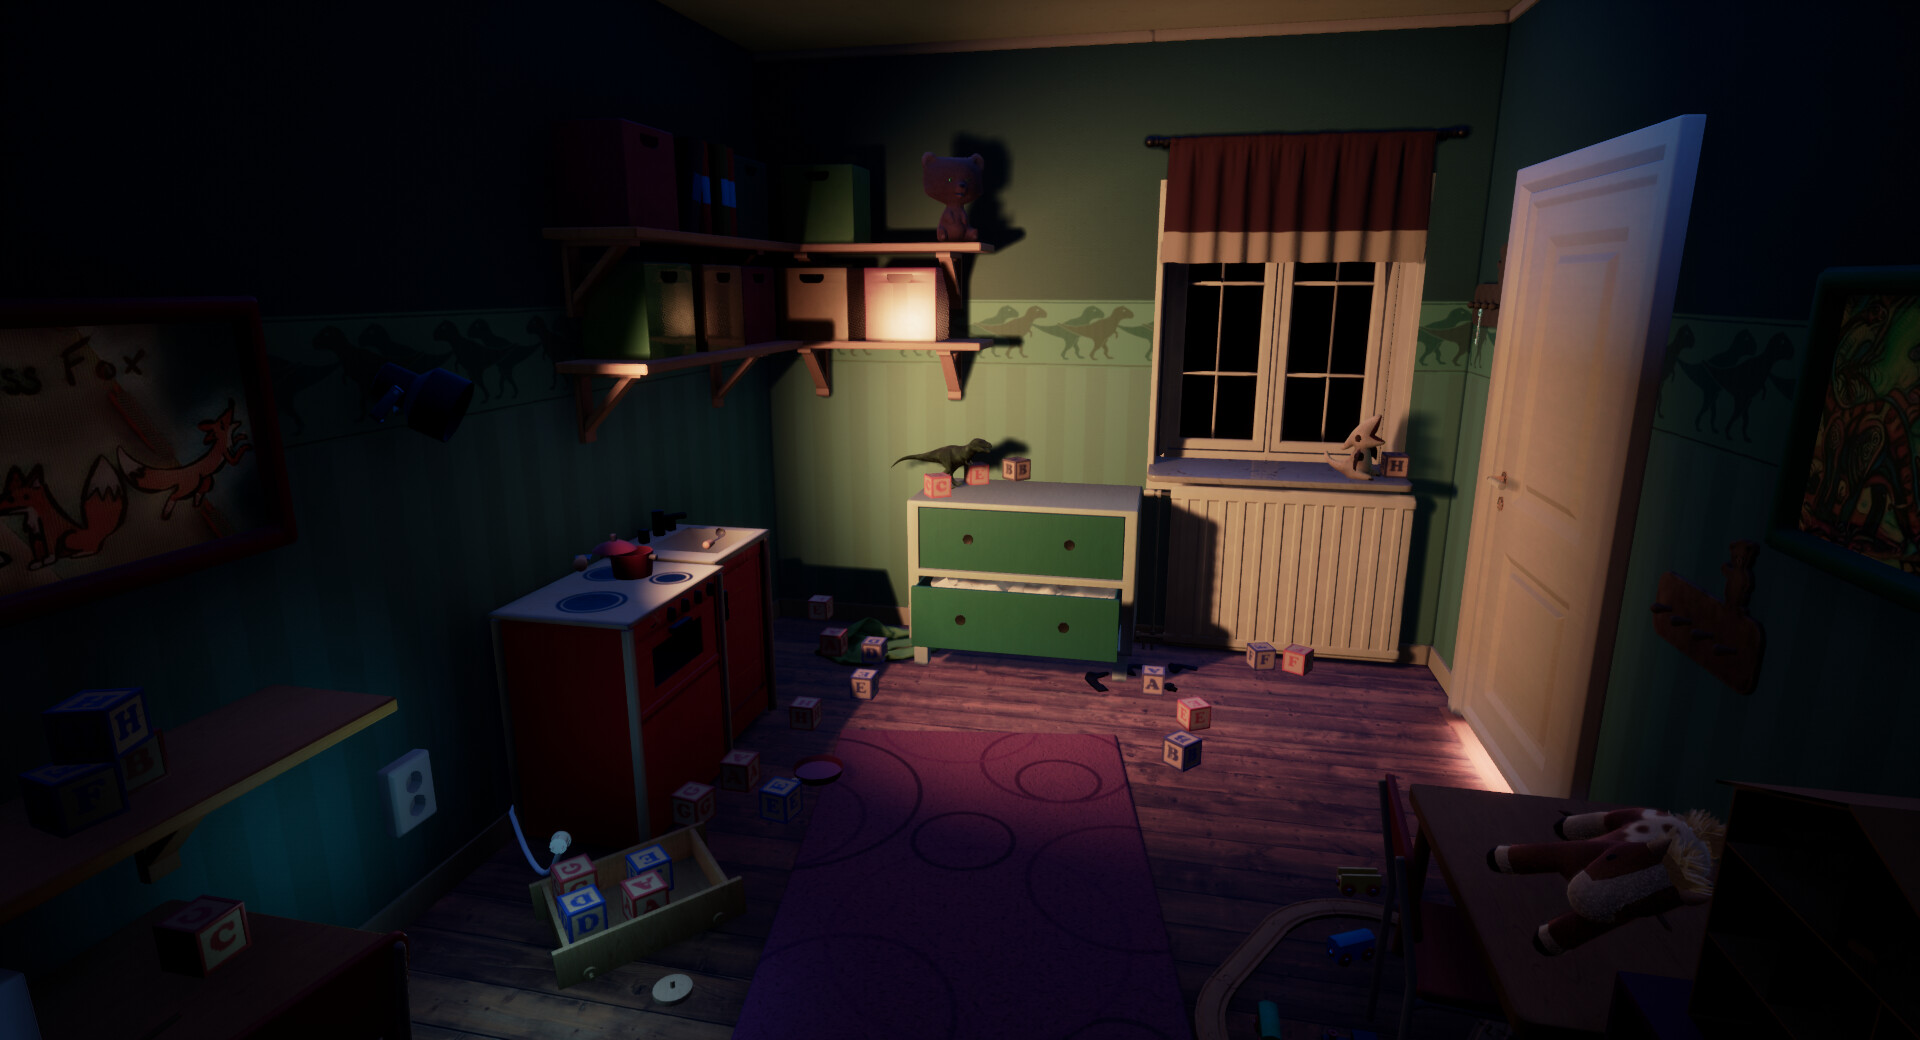 Axel loreman playroom